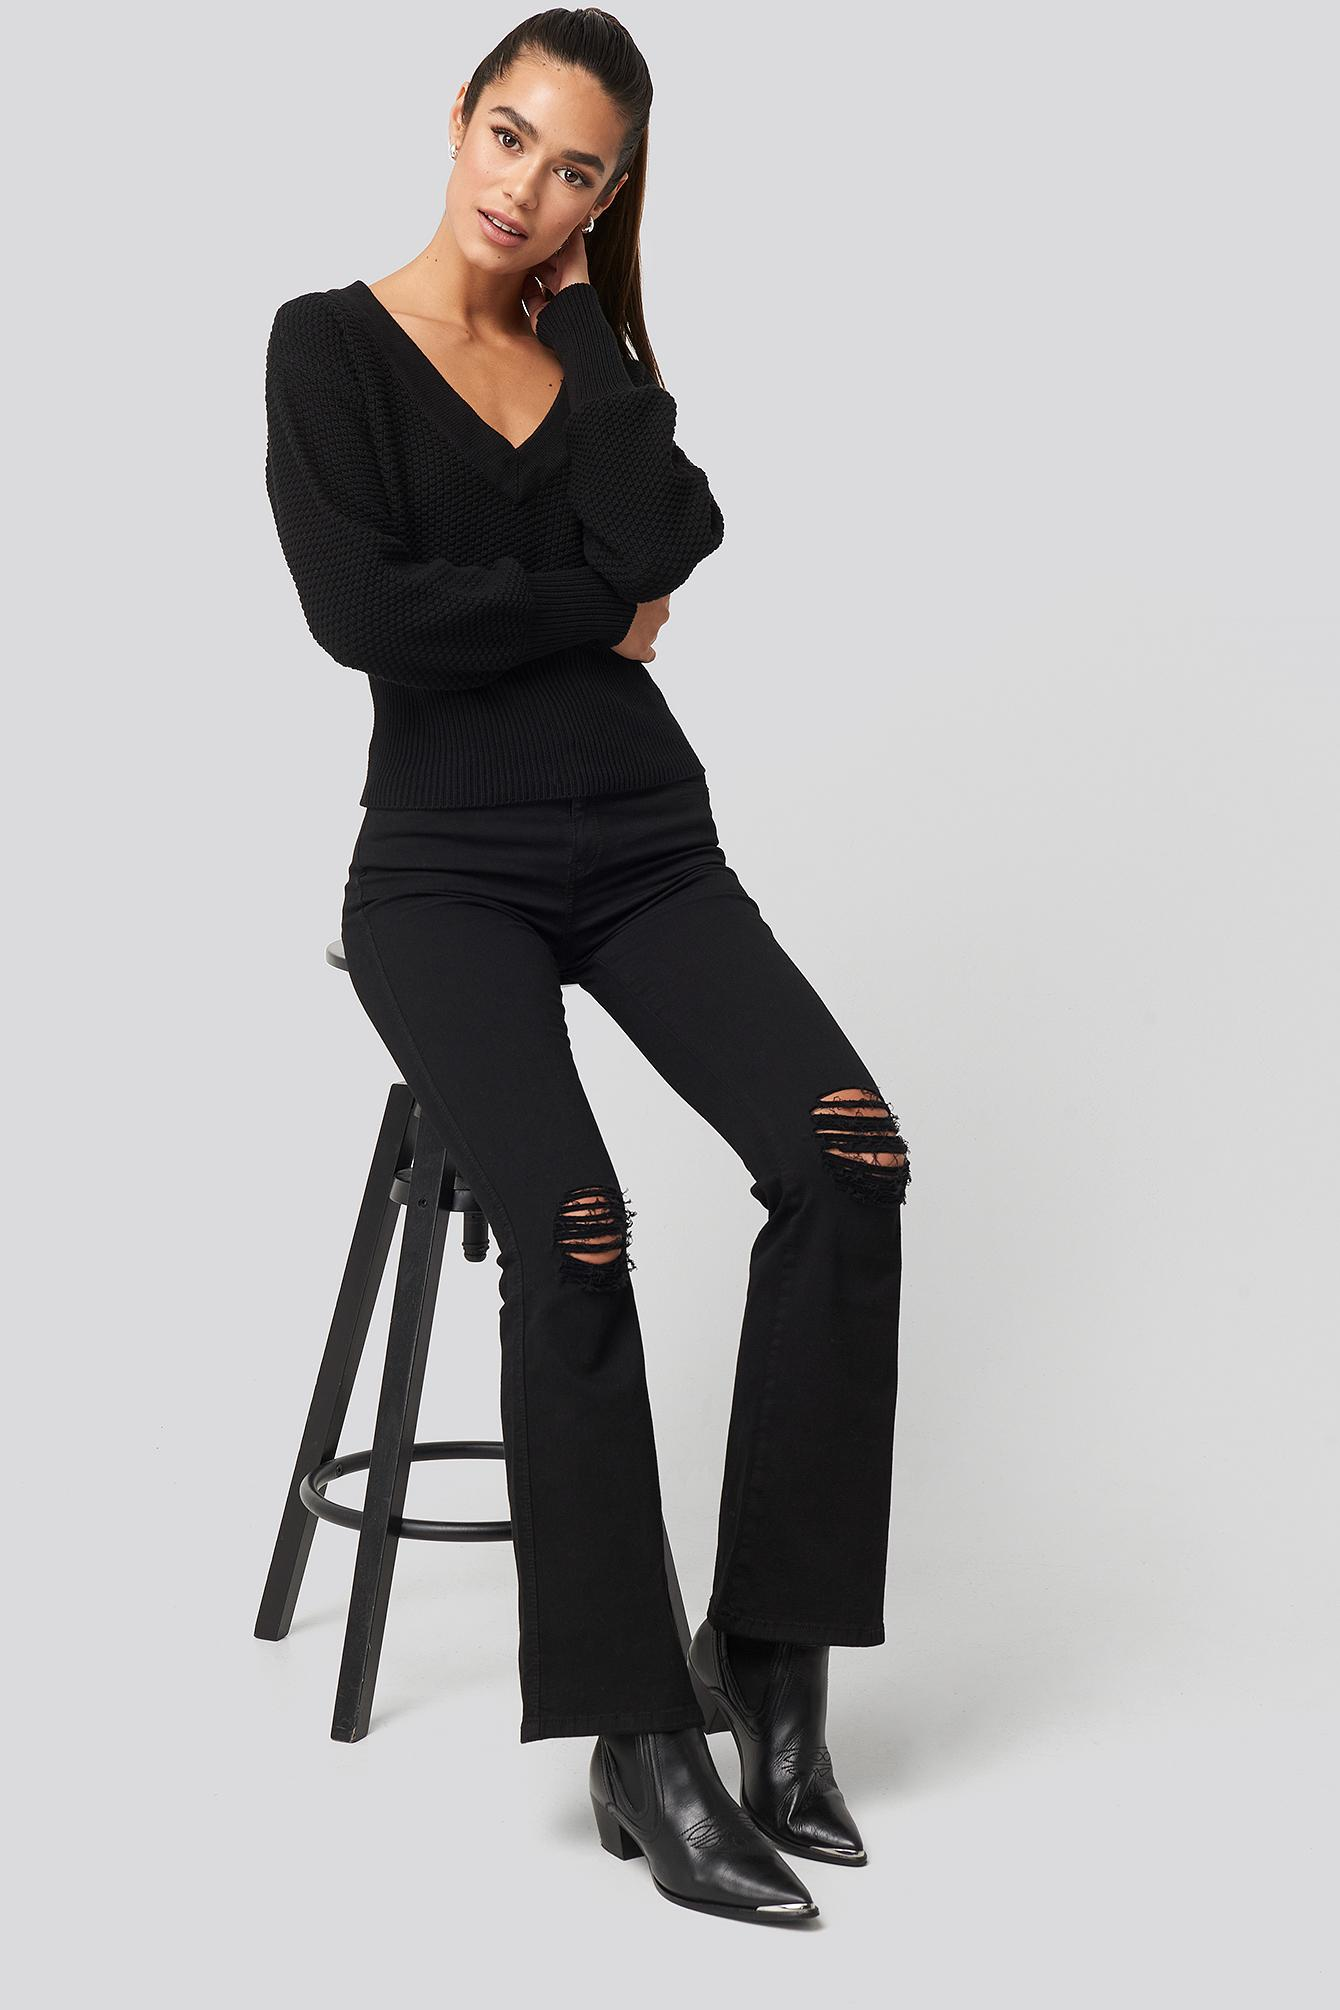 Short Knitted Wide Rib Sweater Coton NA-KD en coloris Noir